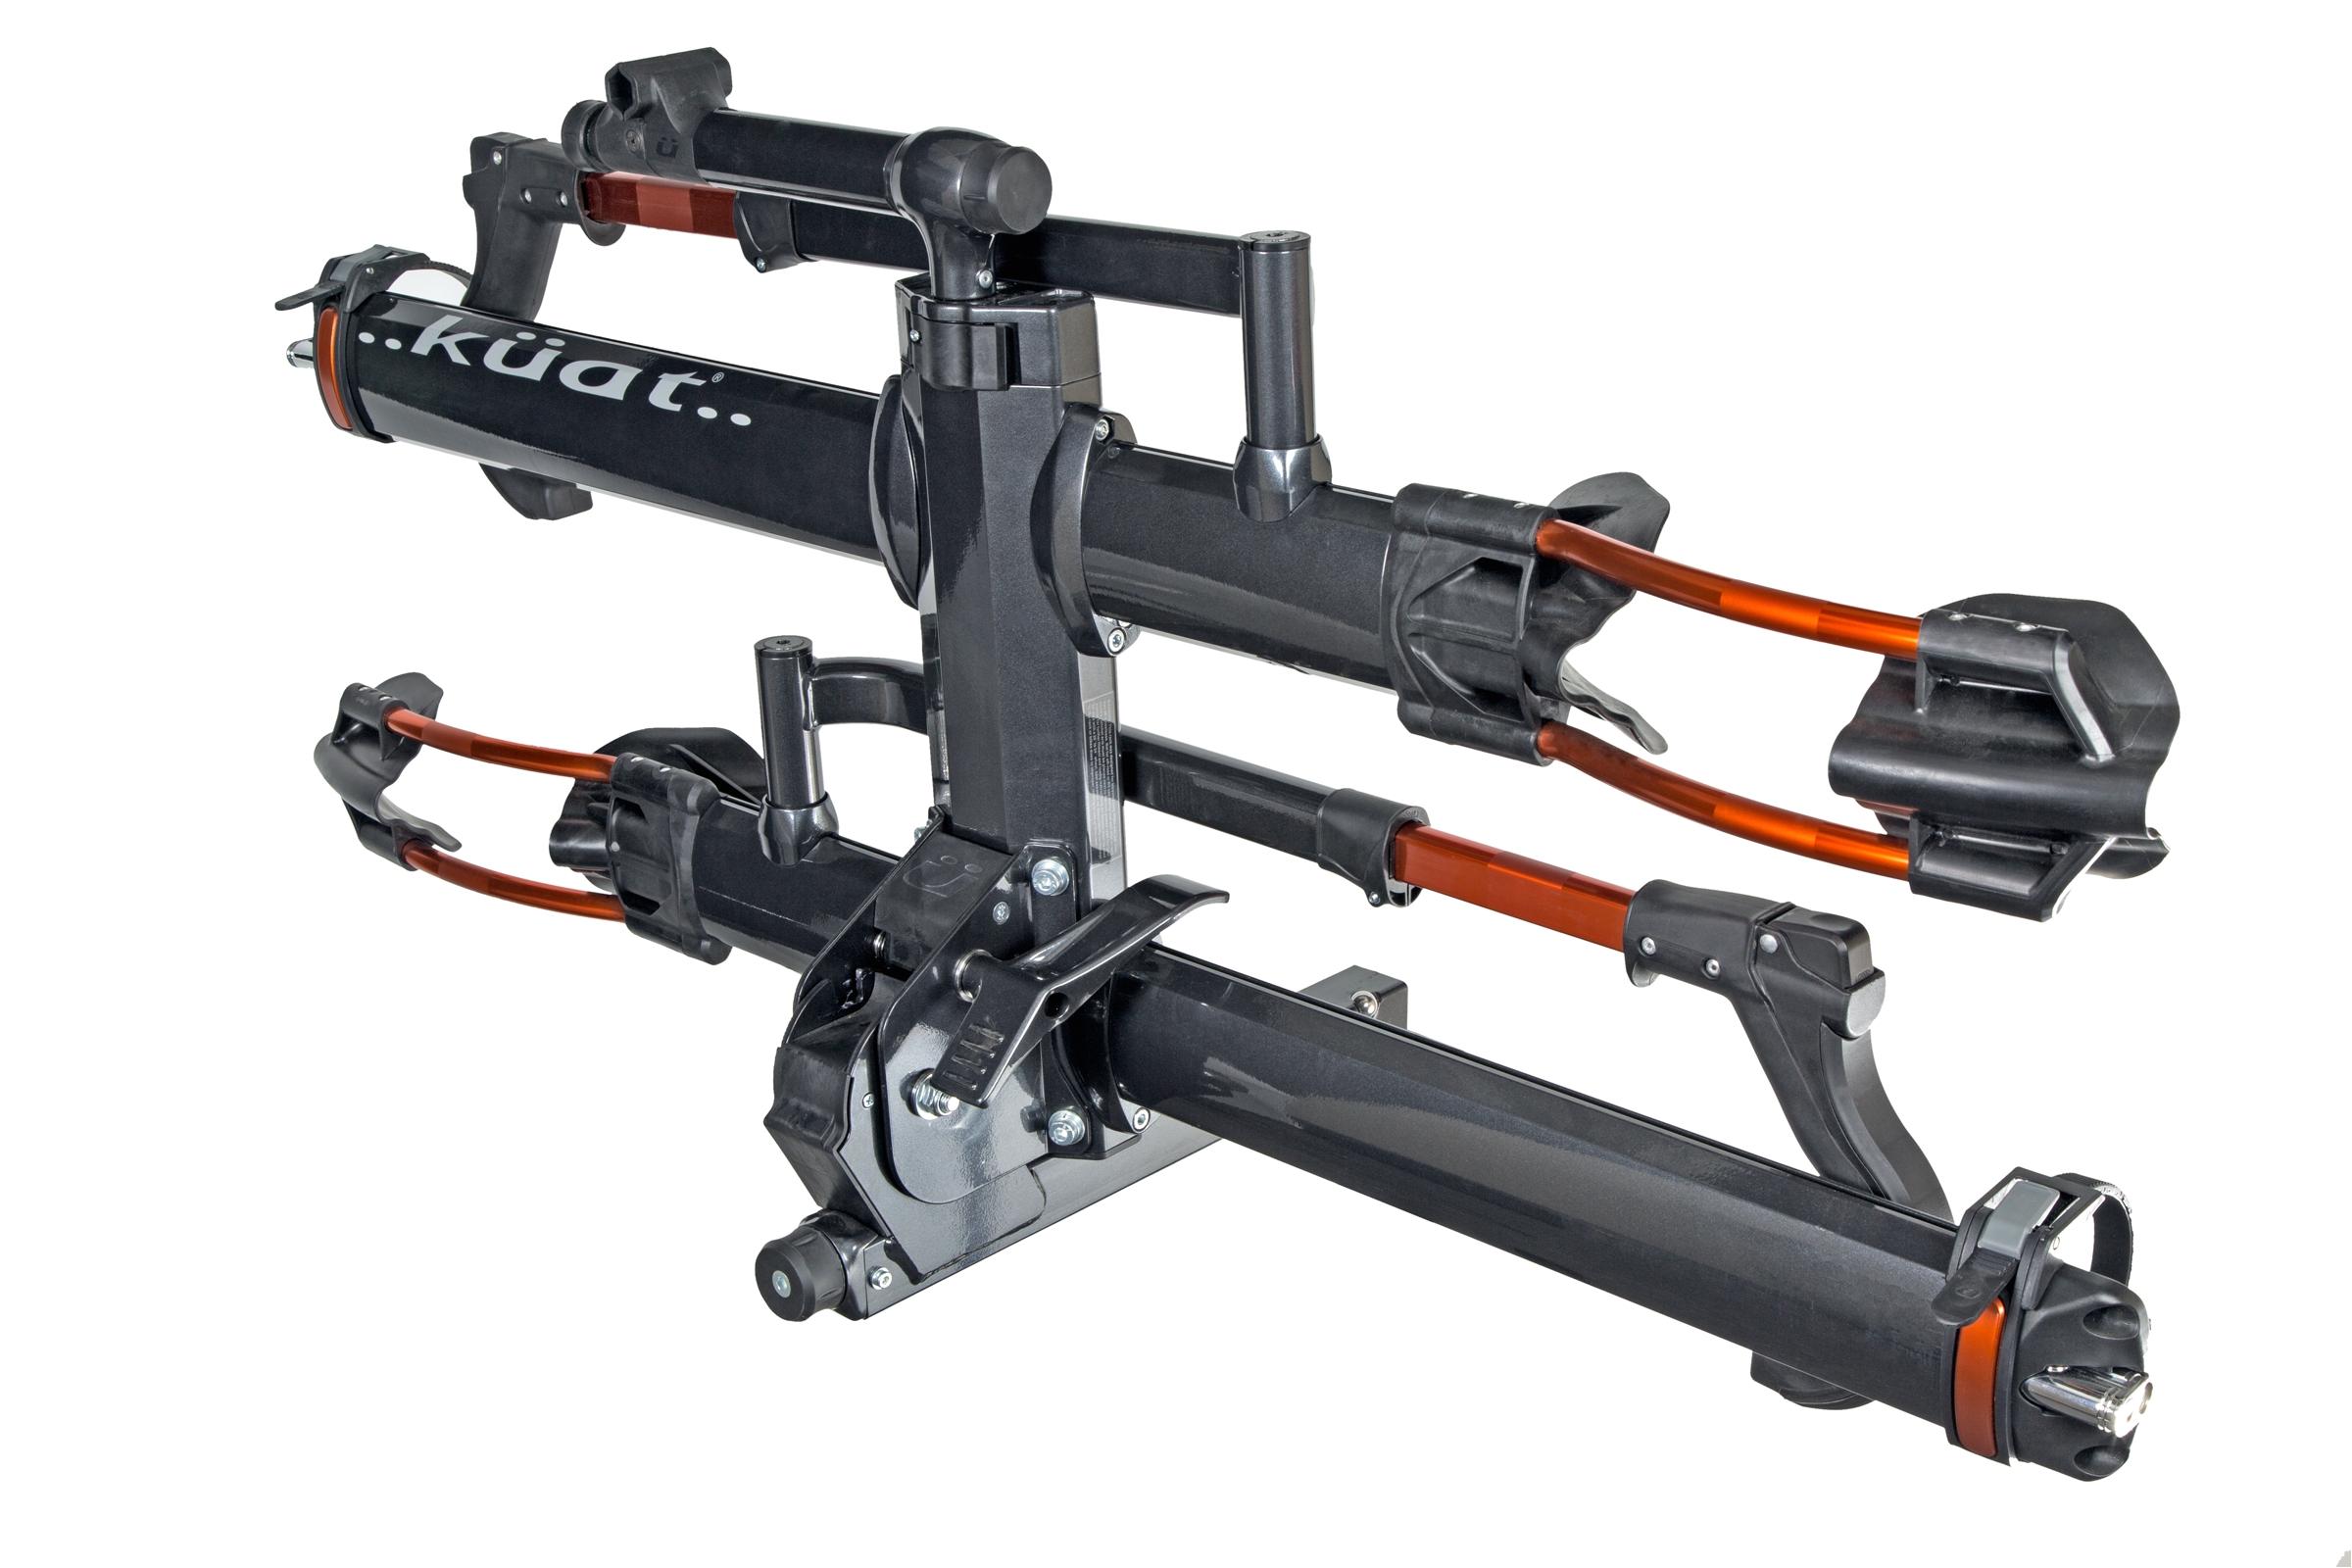 Kuat Nv 2-bike Hitch Rack 2 Gunmetal Grey Rack Comparison Kuat Racks